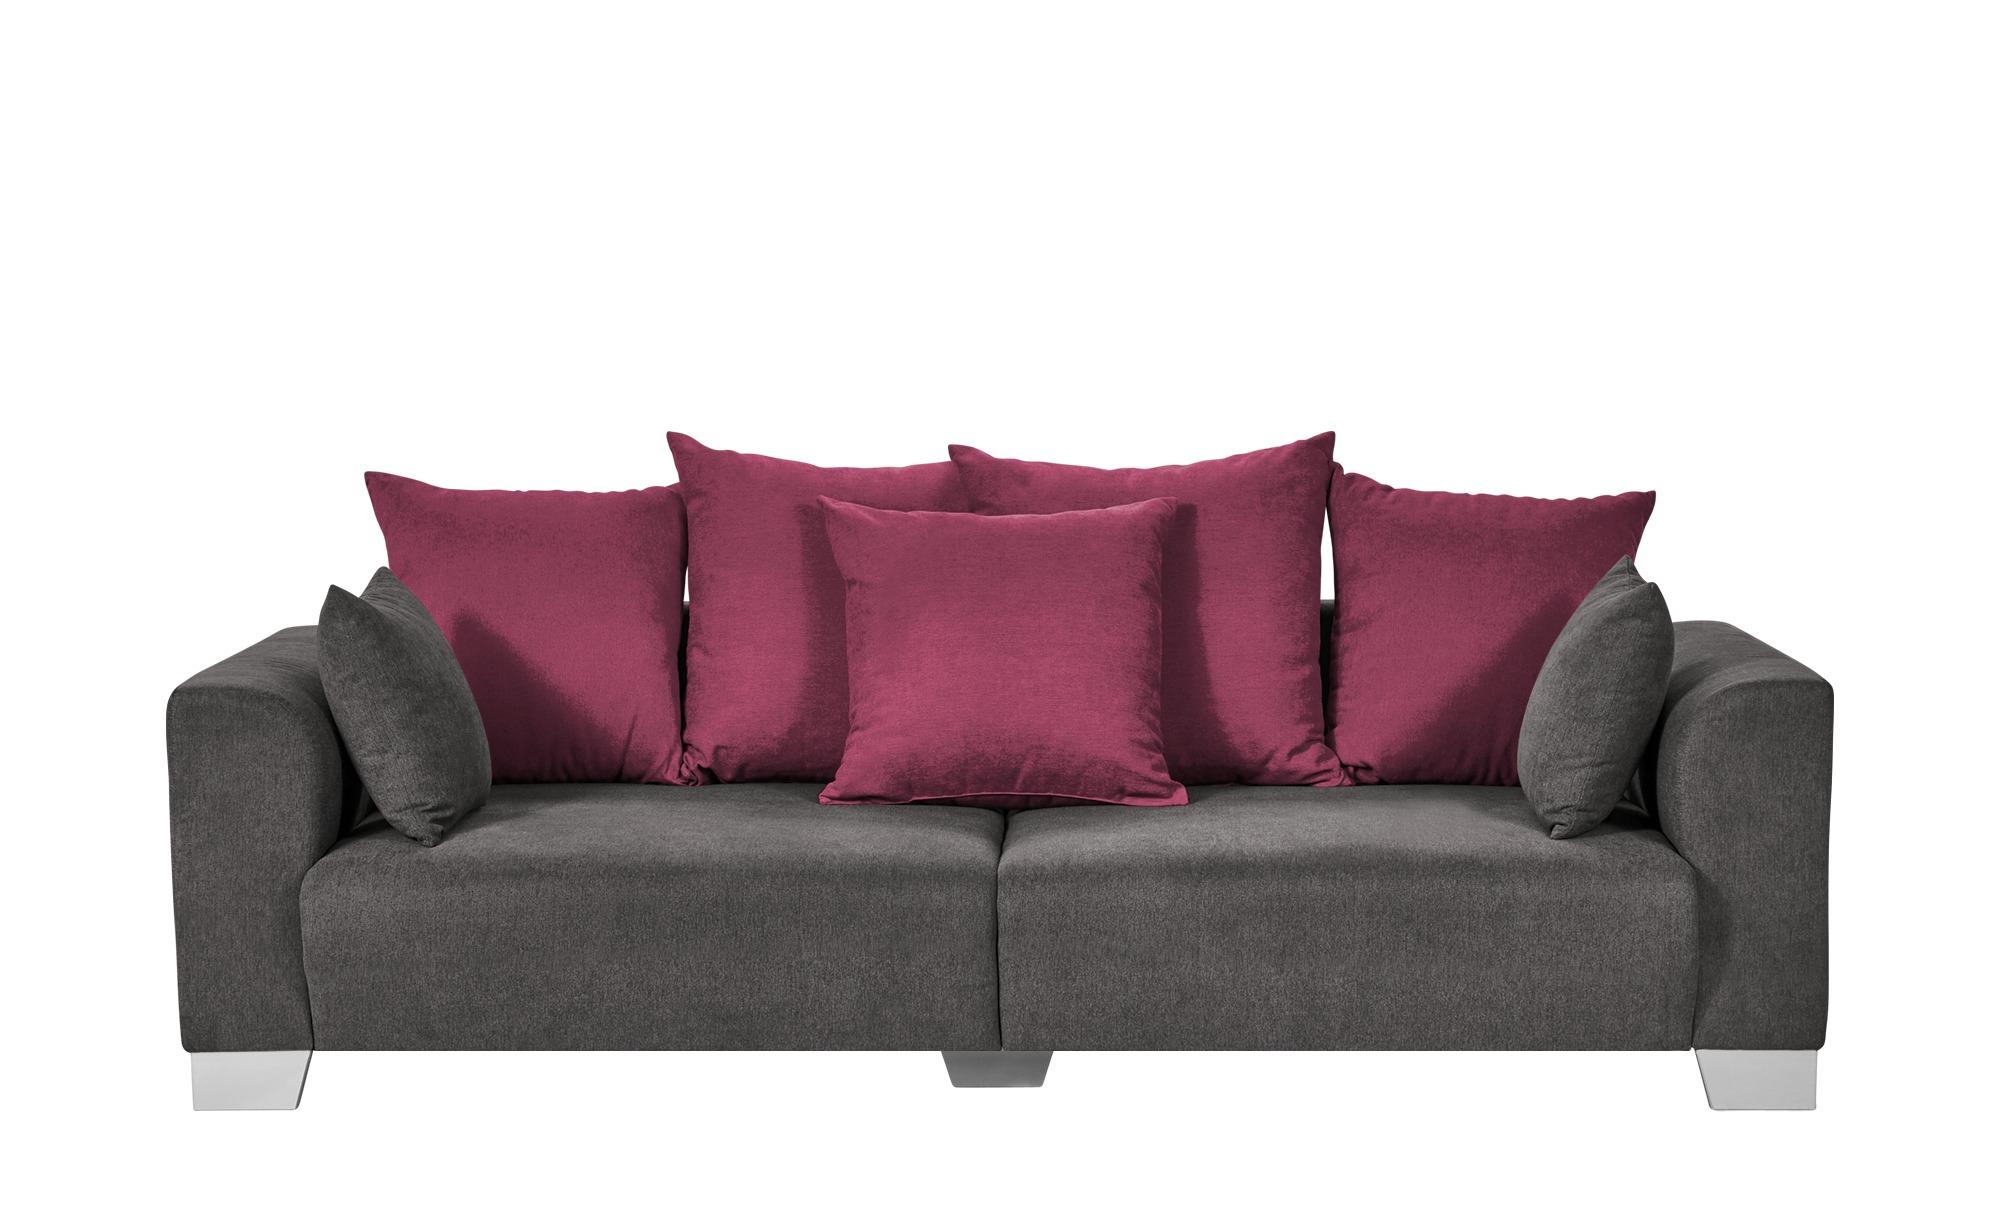 smart Big Sofa grau-braun - Flachgewebe Tonja ¦ grau ¦ Maße (cm): B: 244 H: 68 T: 107 Polstermöbel > Sofas > Big-Sofas - Höffner